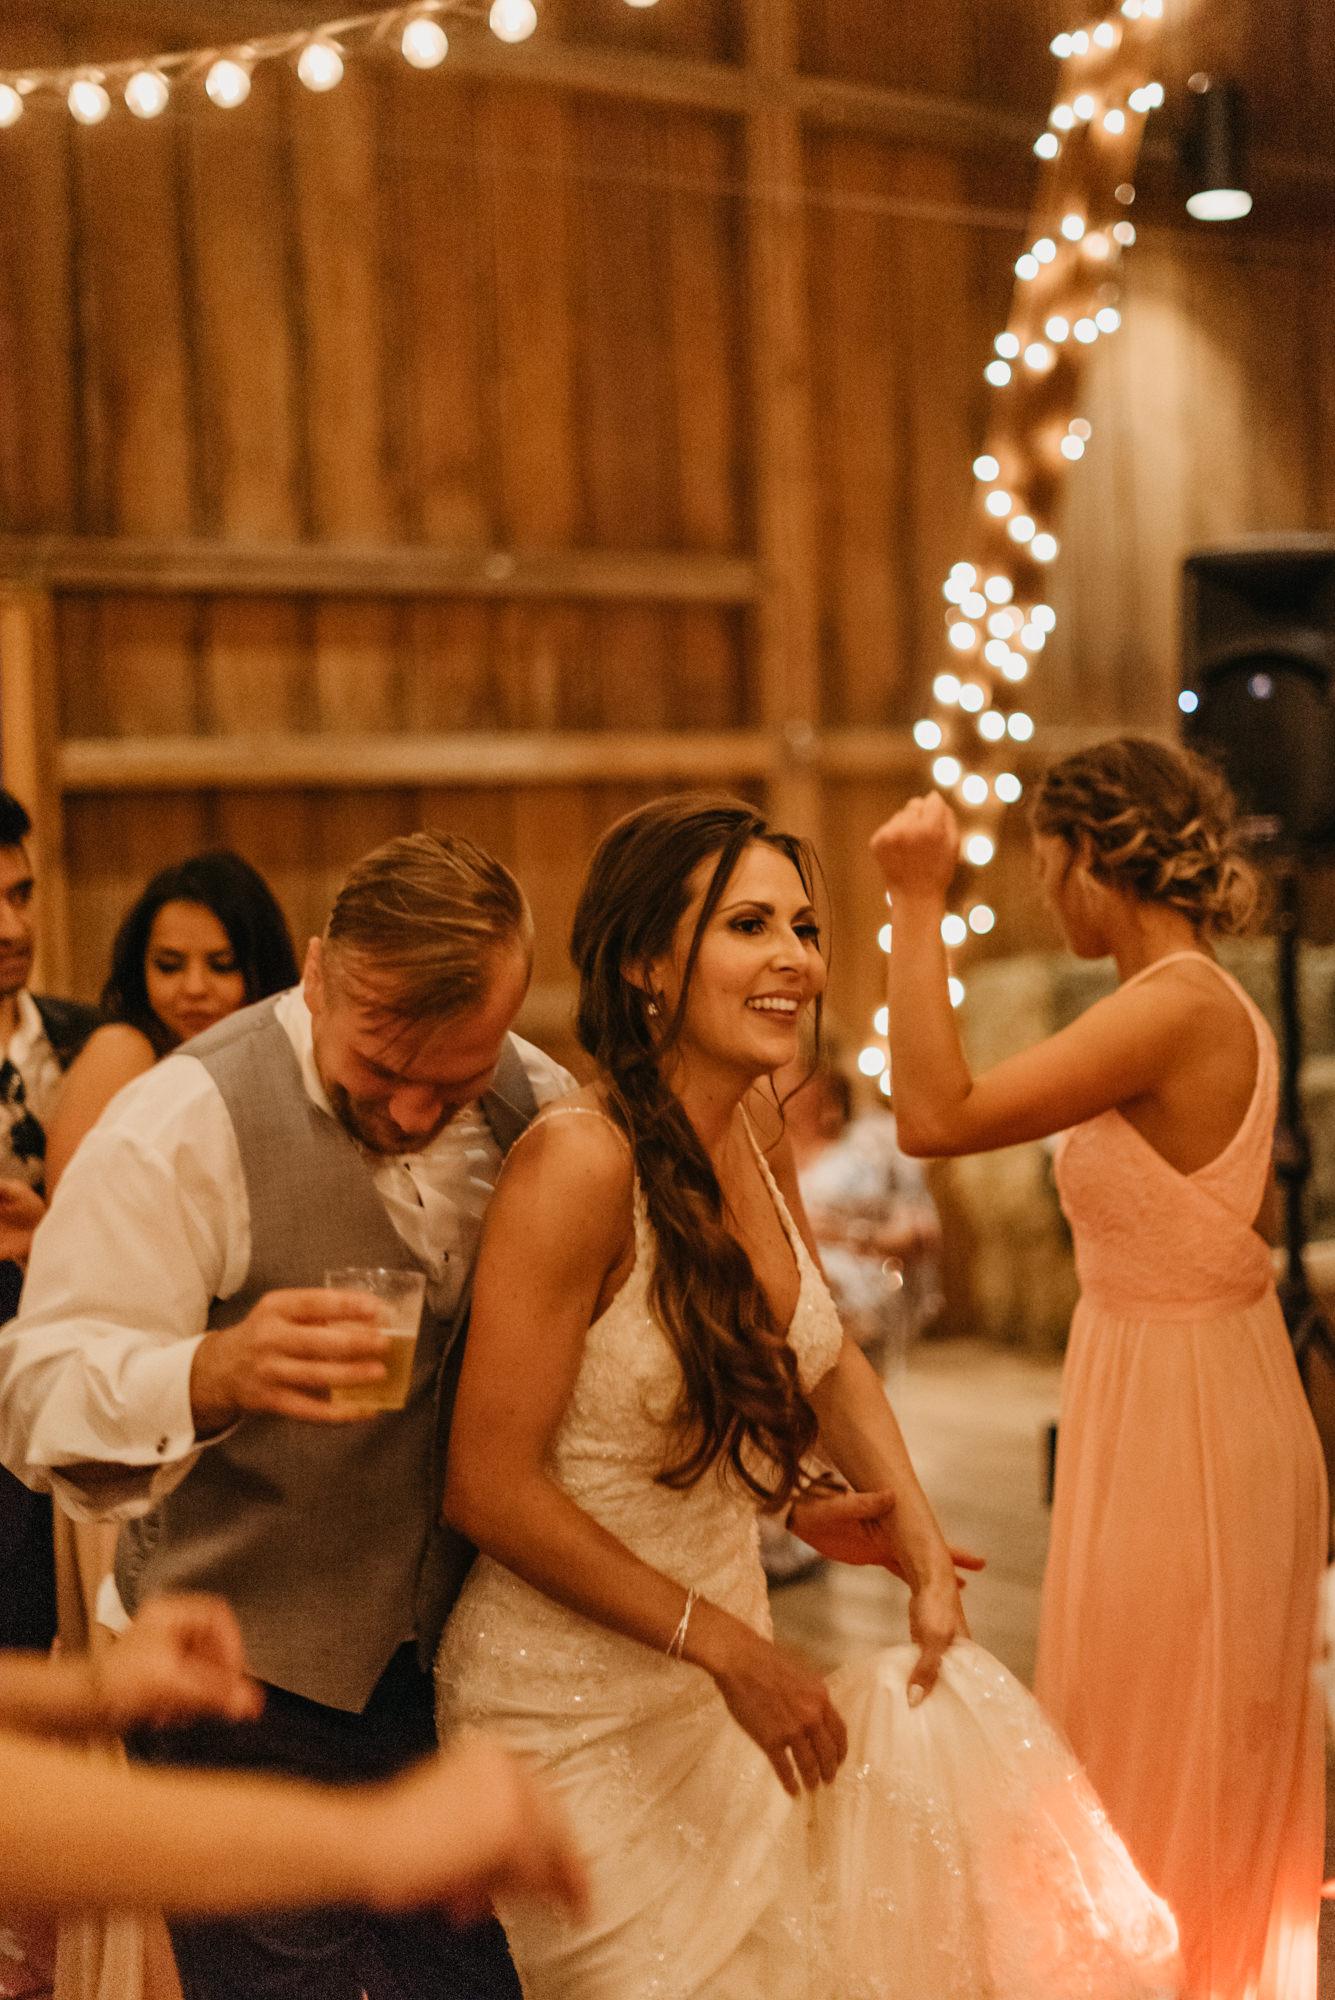 217-portland-northwest-wedding-bubble-exit-barn-string-lights.jpg